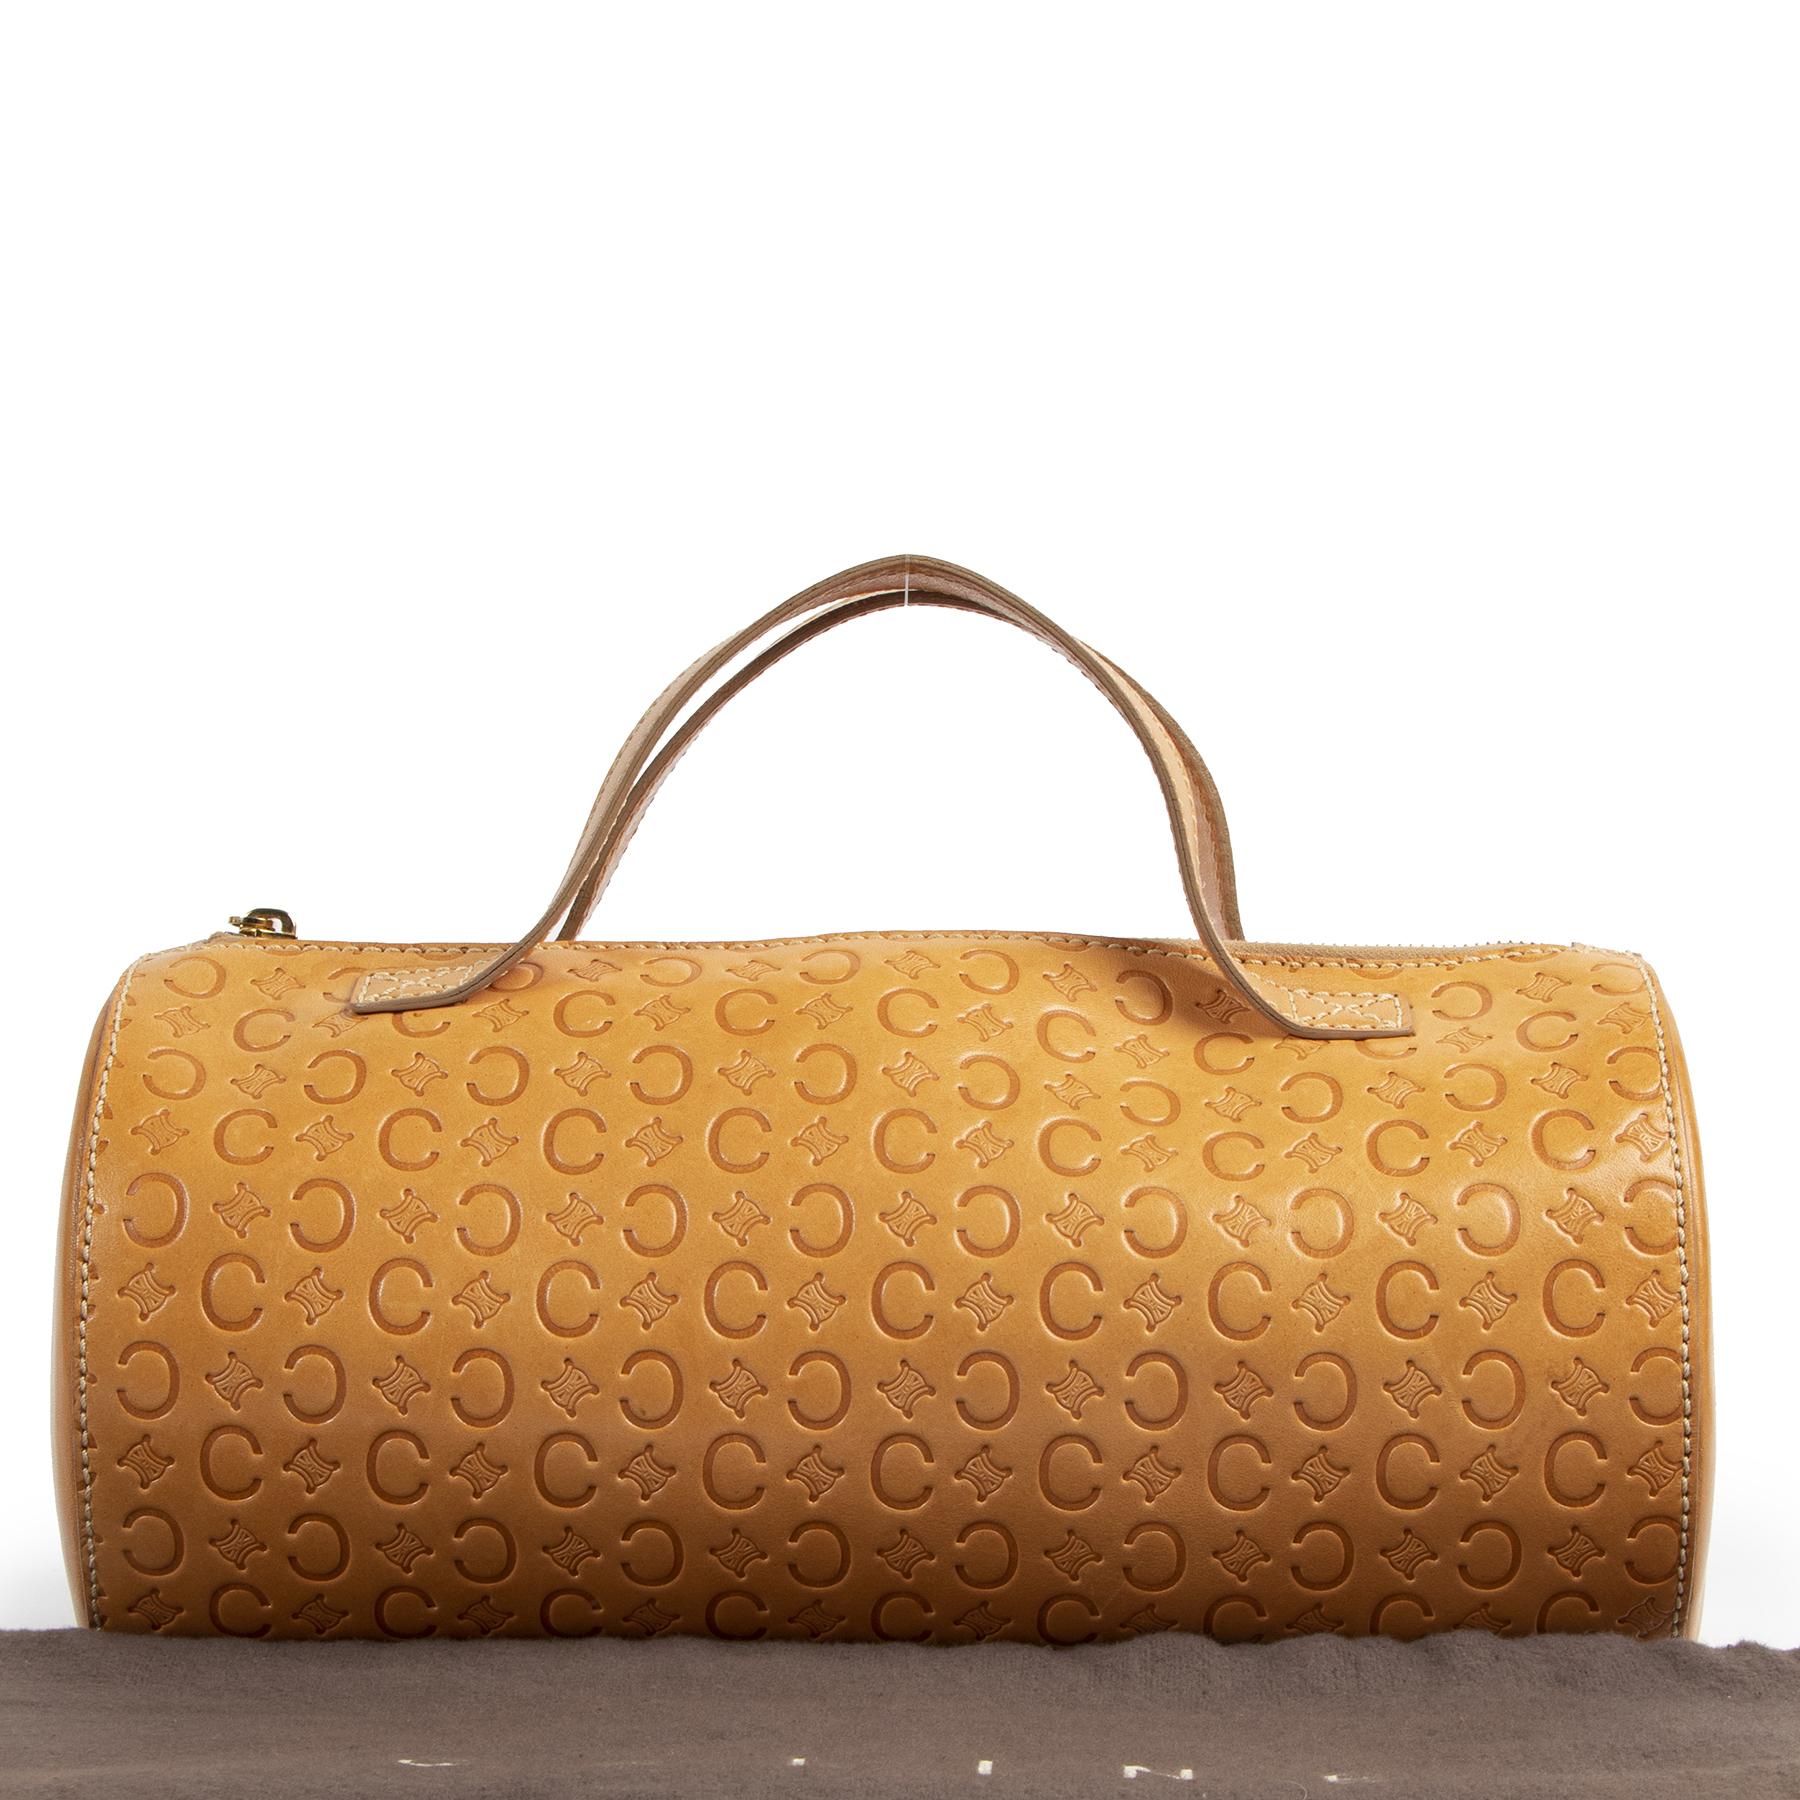 Celine Paris Vintage Round Top Handle Bag